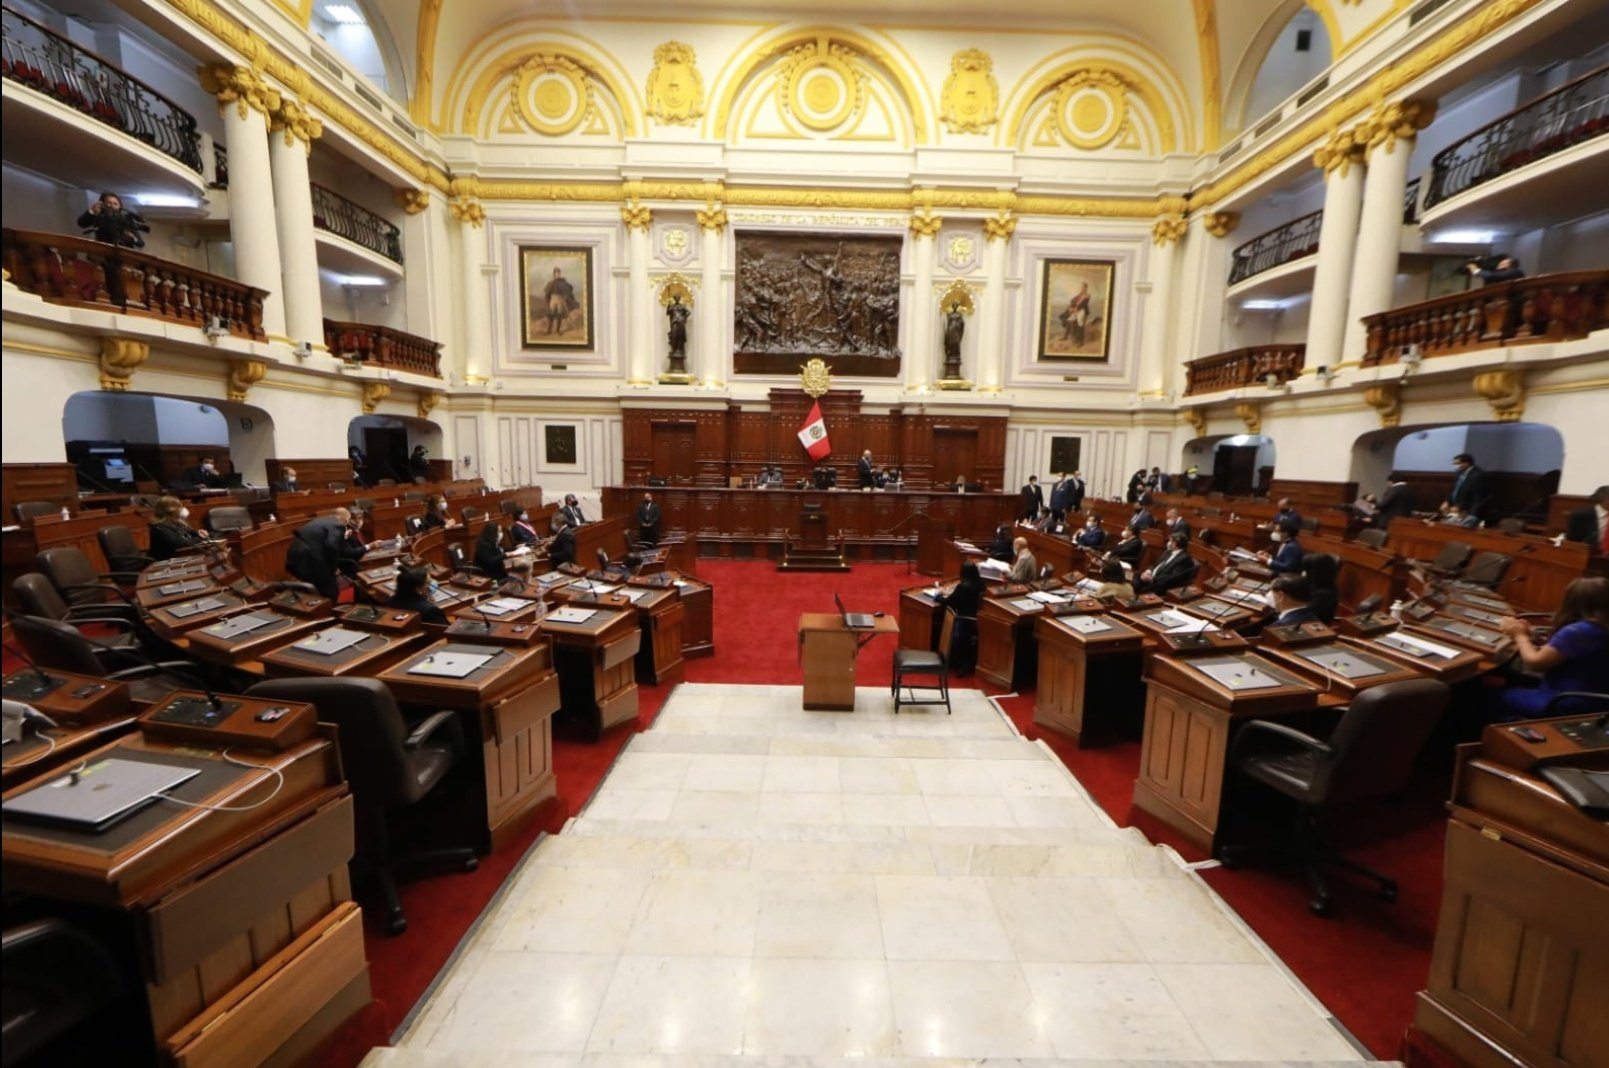 pleno-del-congreso-aprobo-ley-agraria